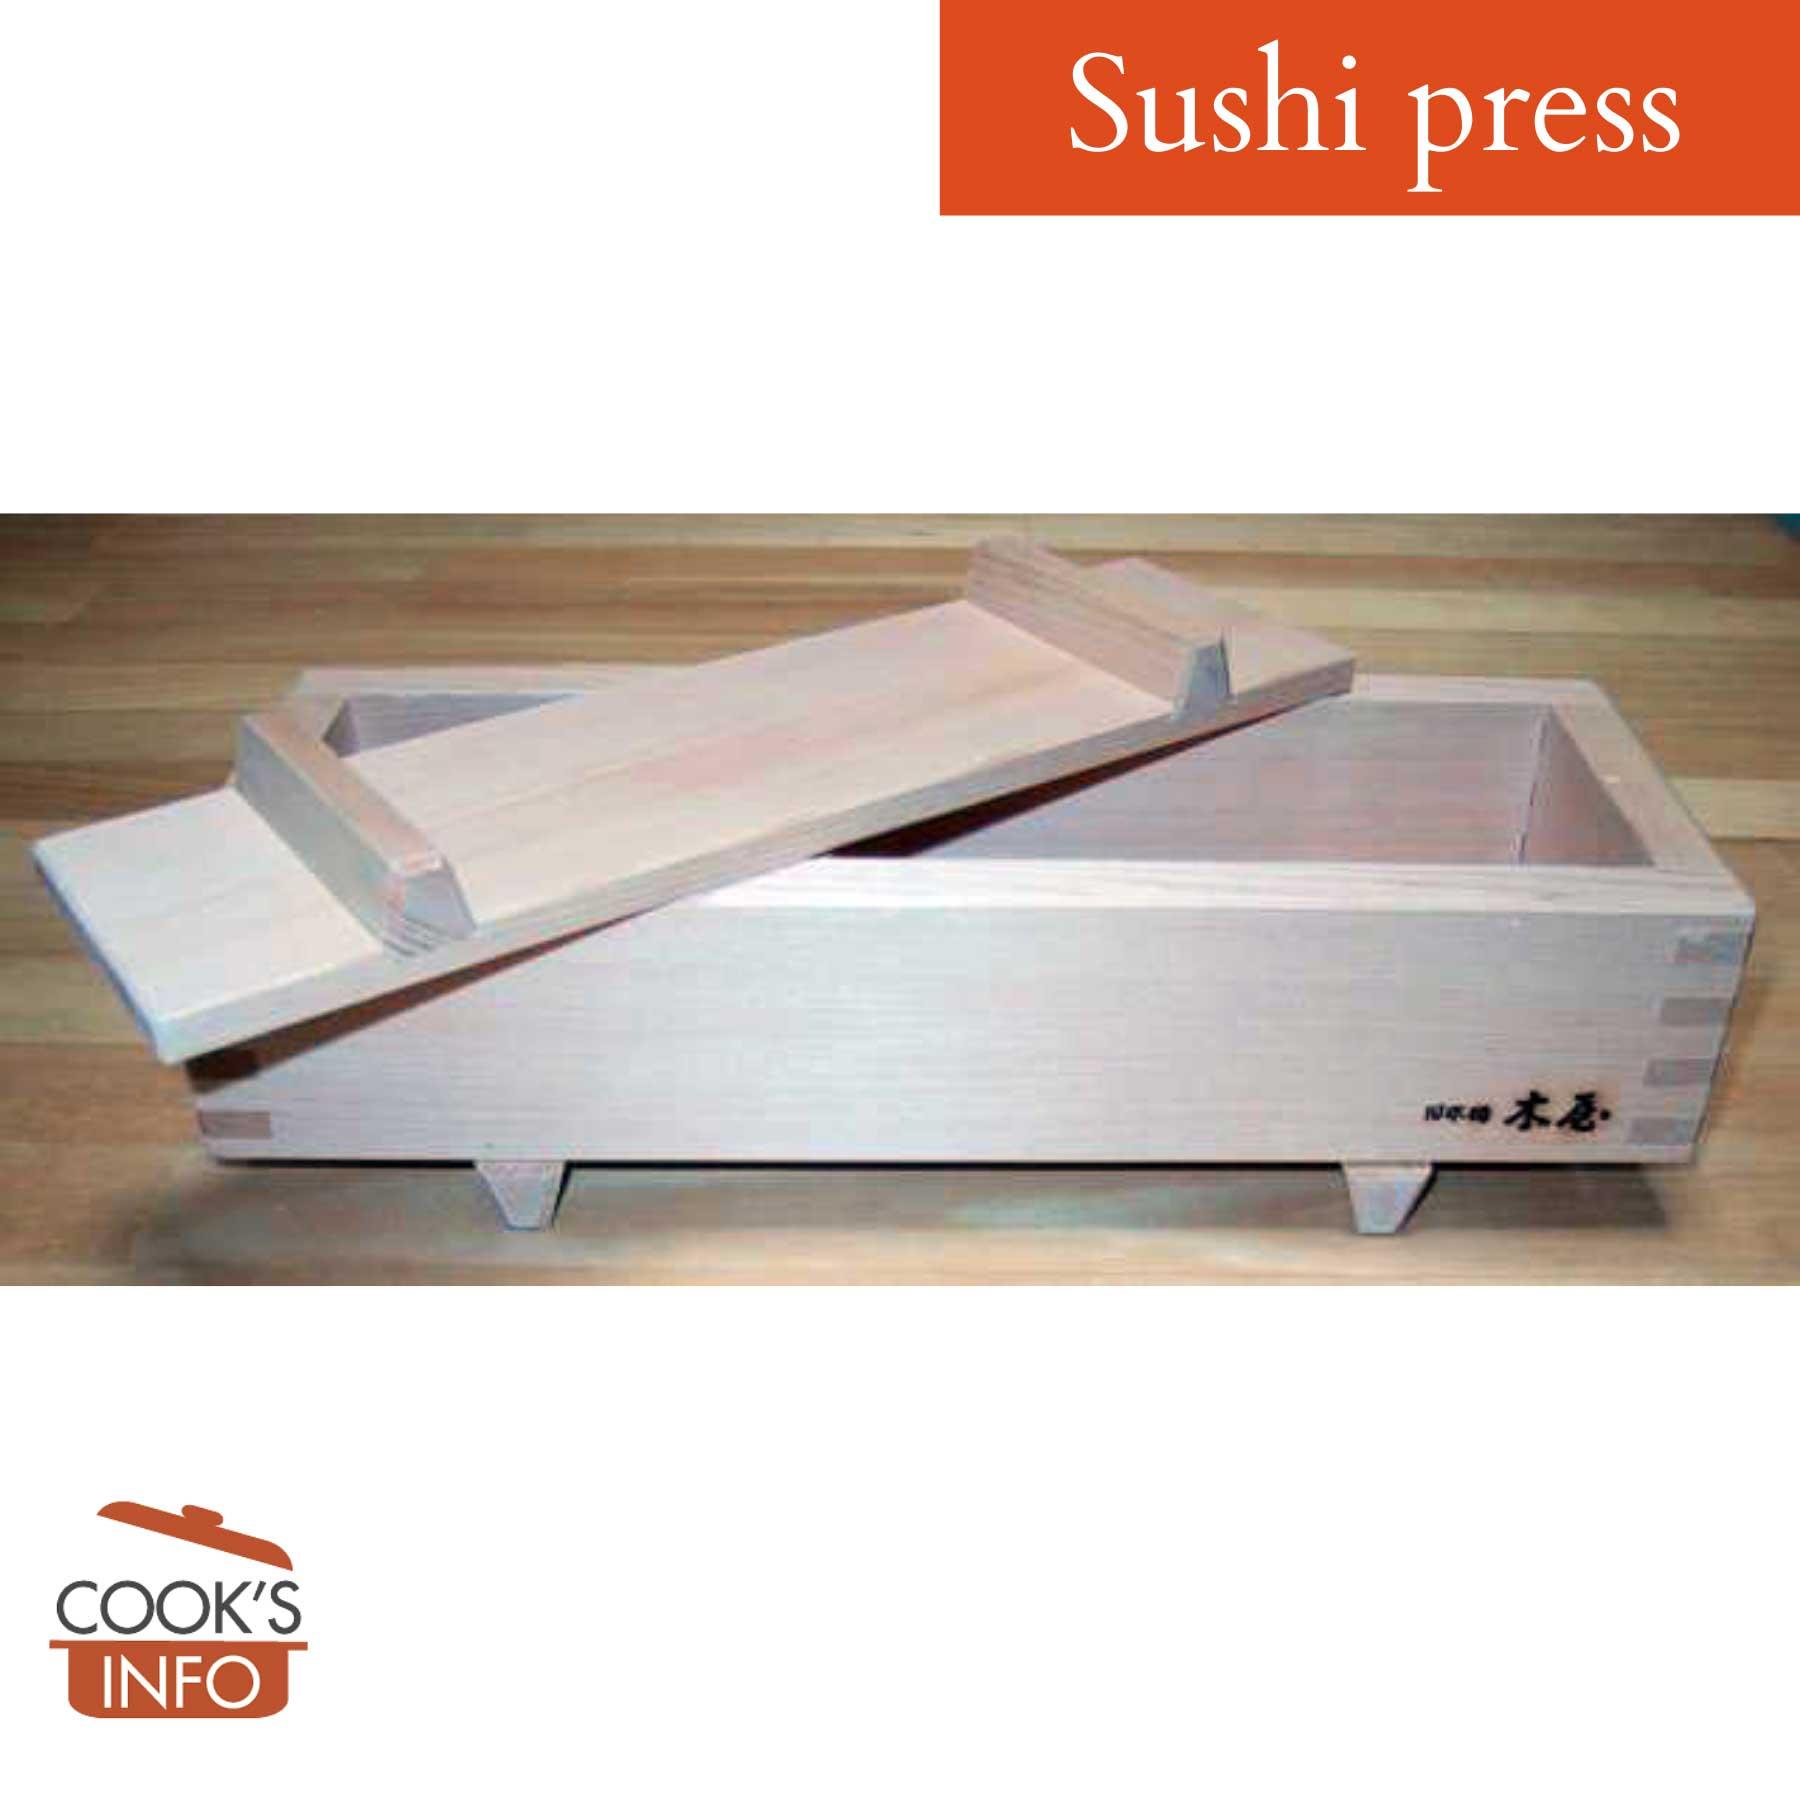 Sushi press